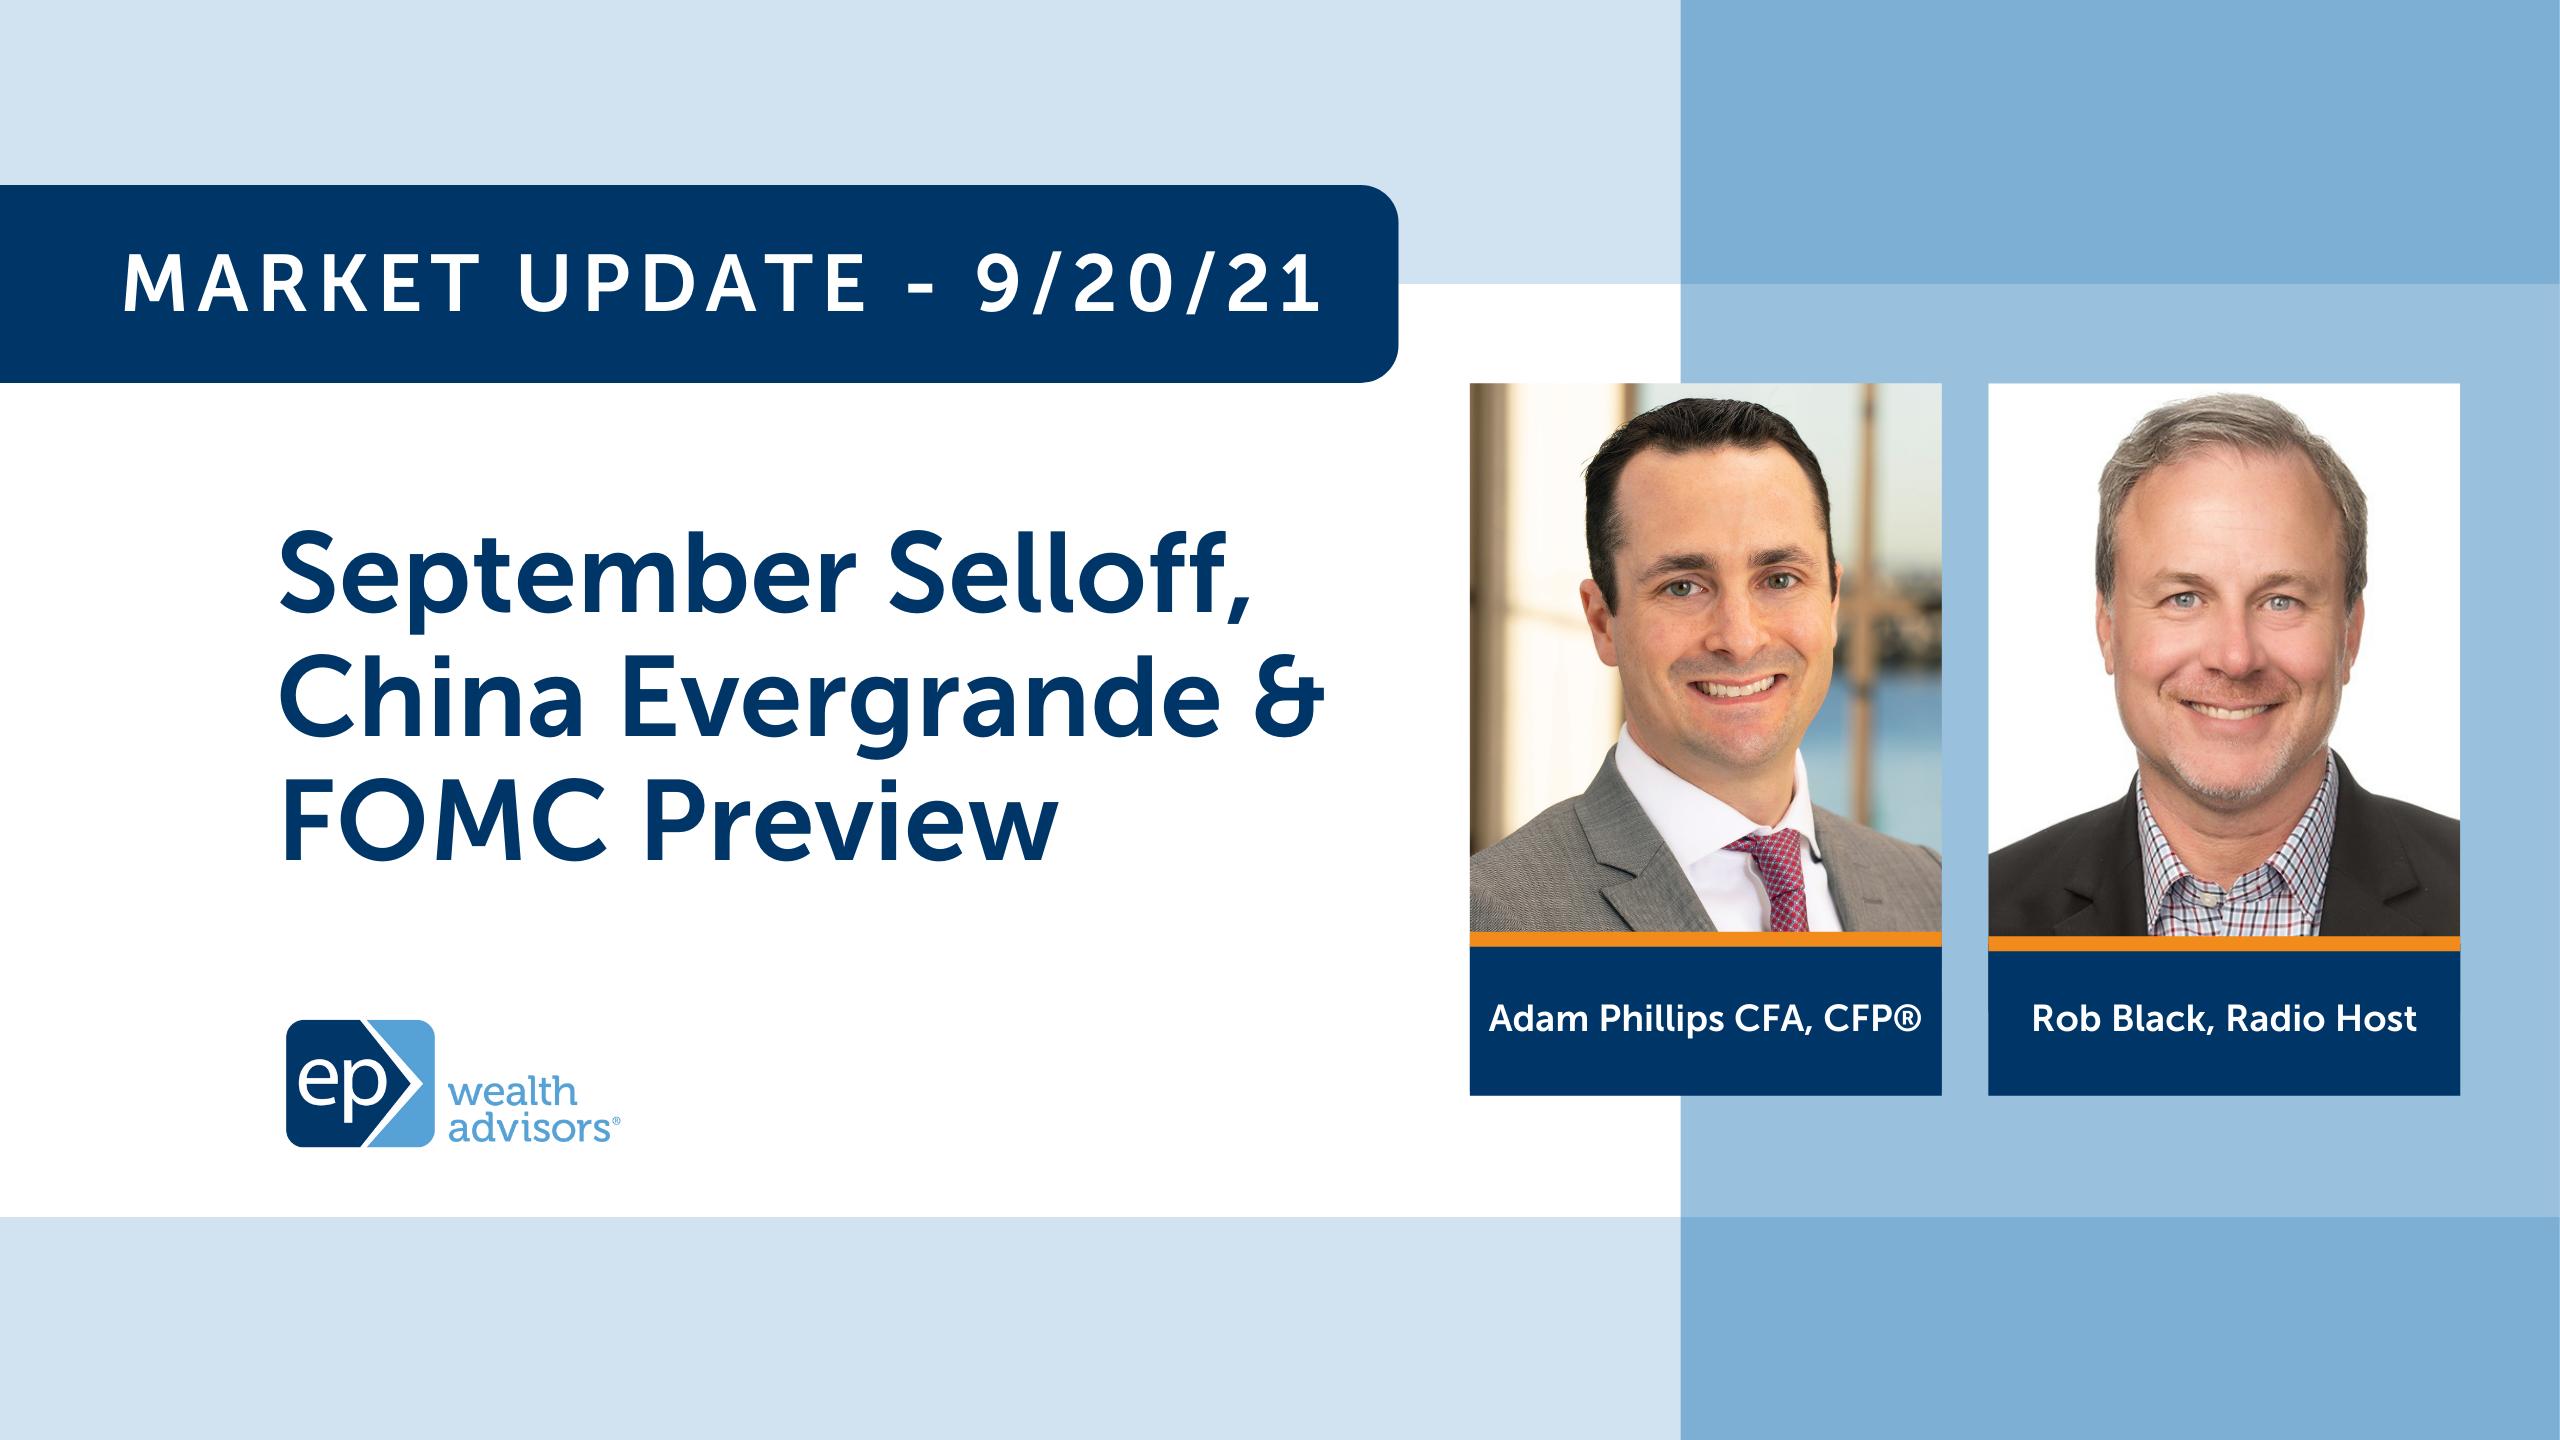 September Selloff, China Evergrande & FOMC Preview